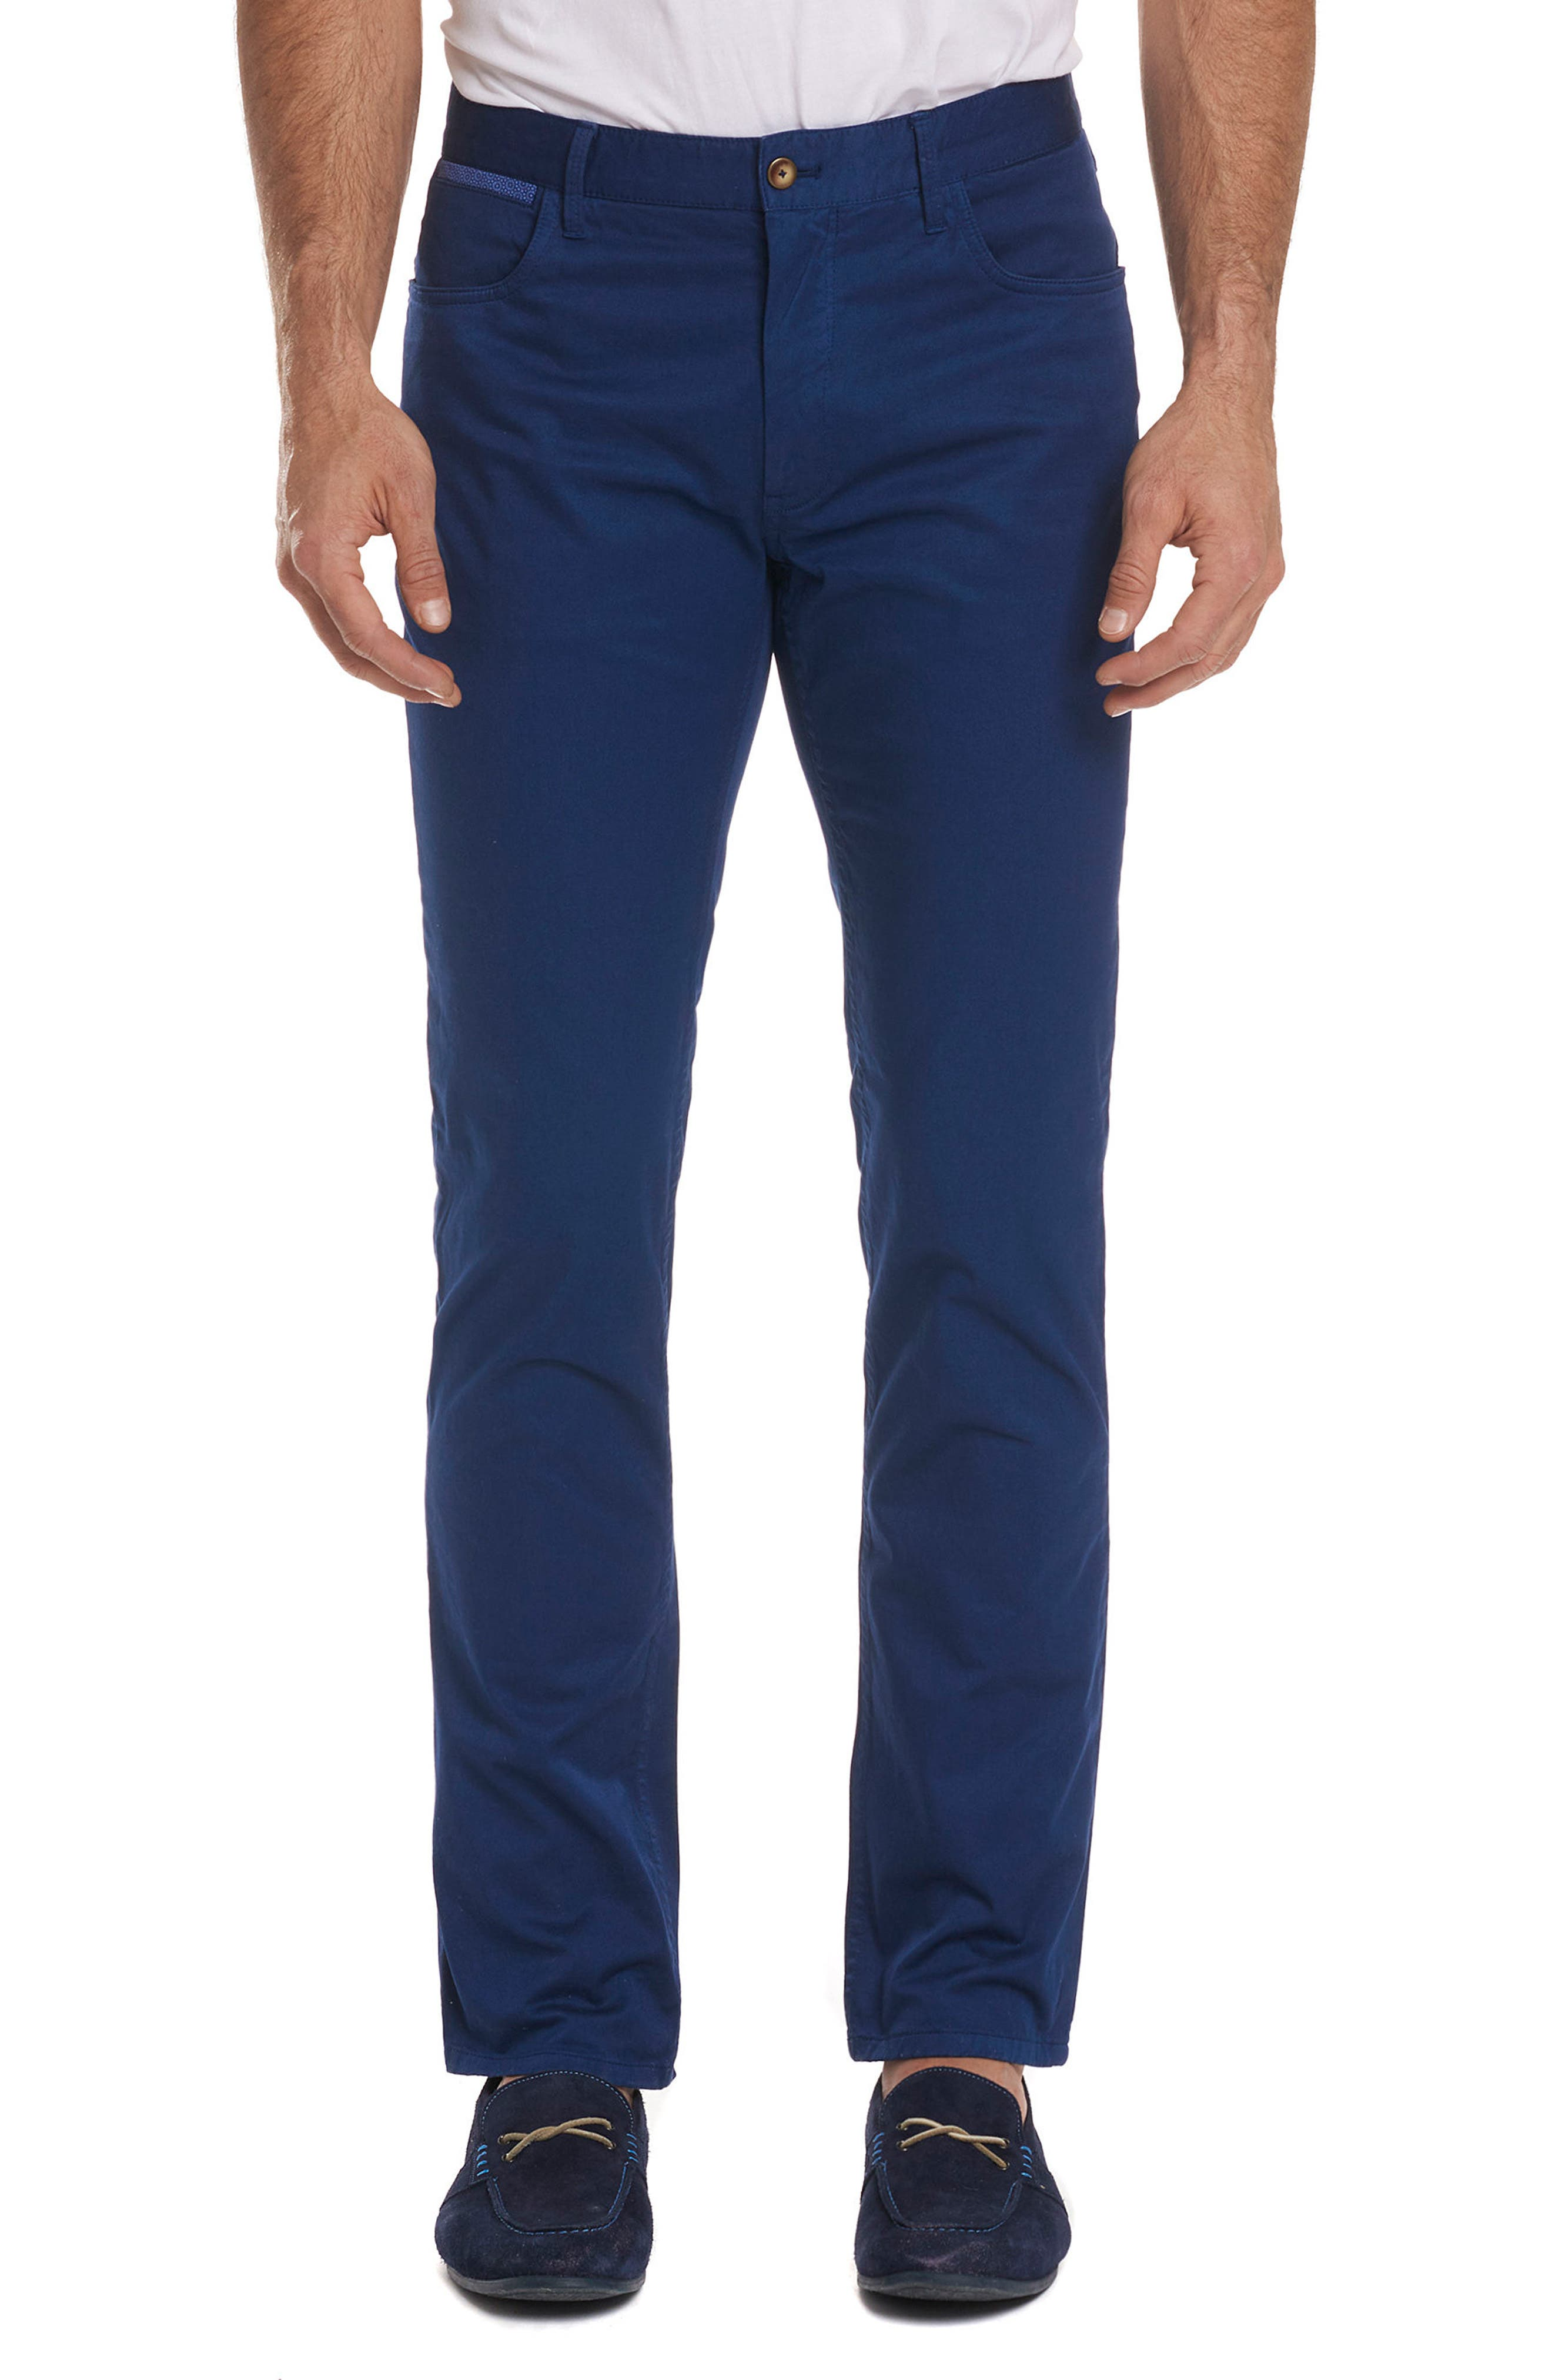 Marti Tailored Fit Pants,                             Main thumbnail 1, color,                             BLUE